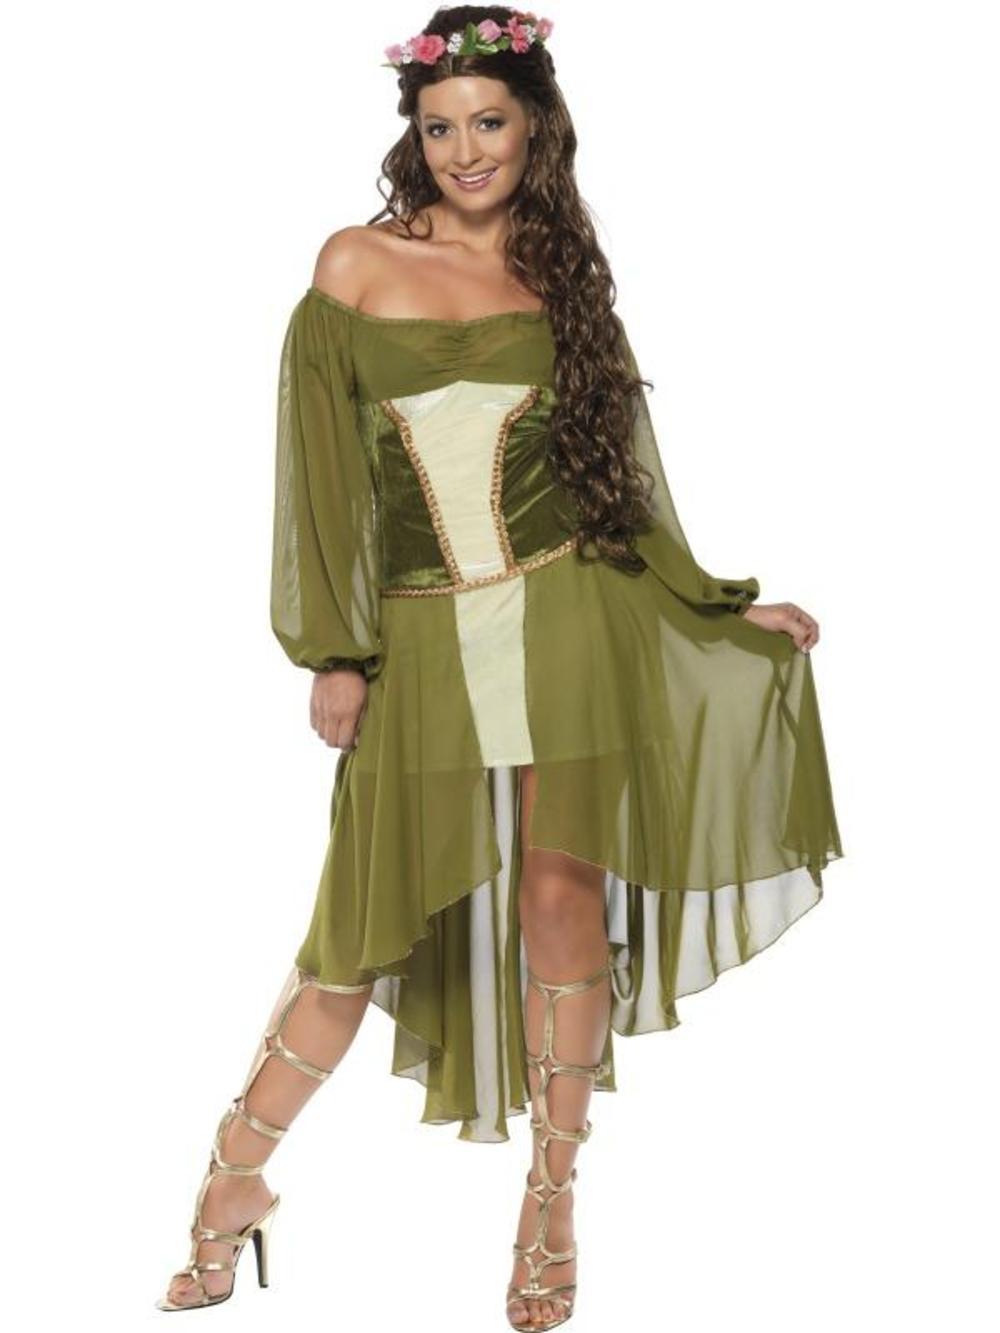 Maid Marion Medieval Fancy Dress Ladies Robin Hood Maiden Adult Costume UK 8-14